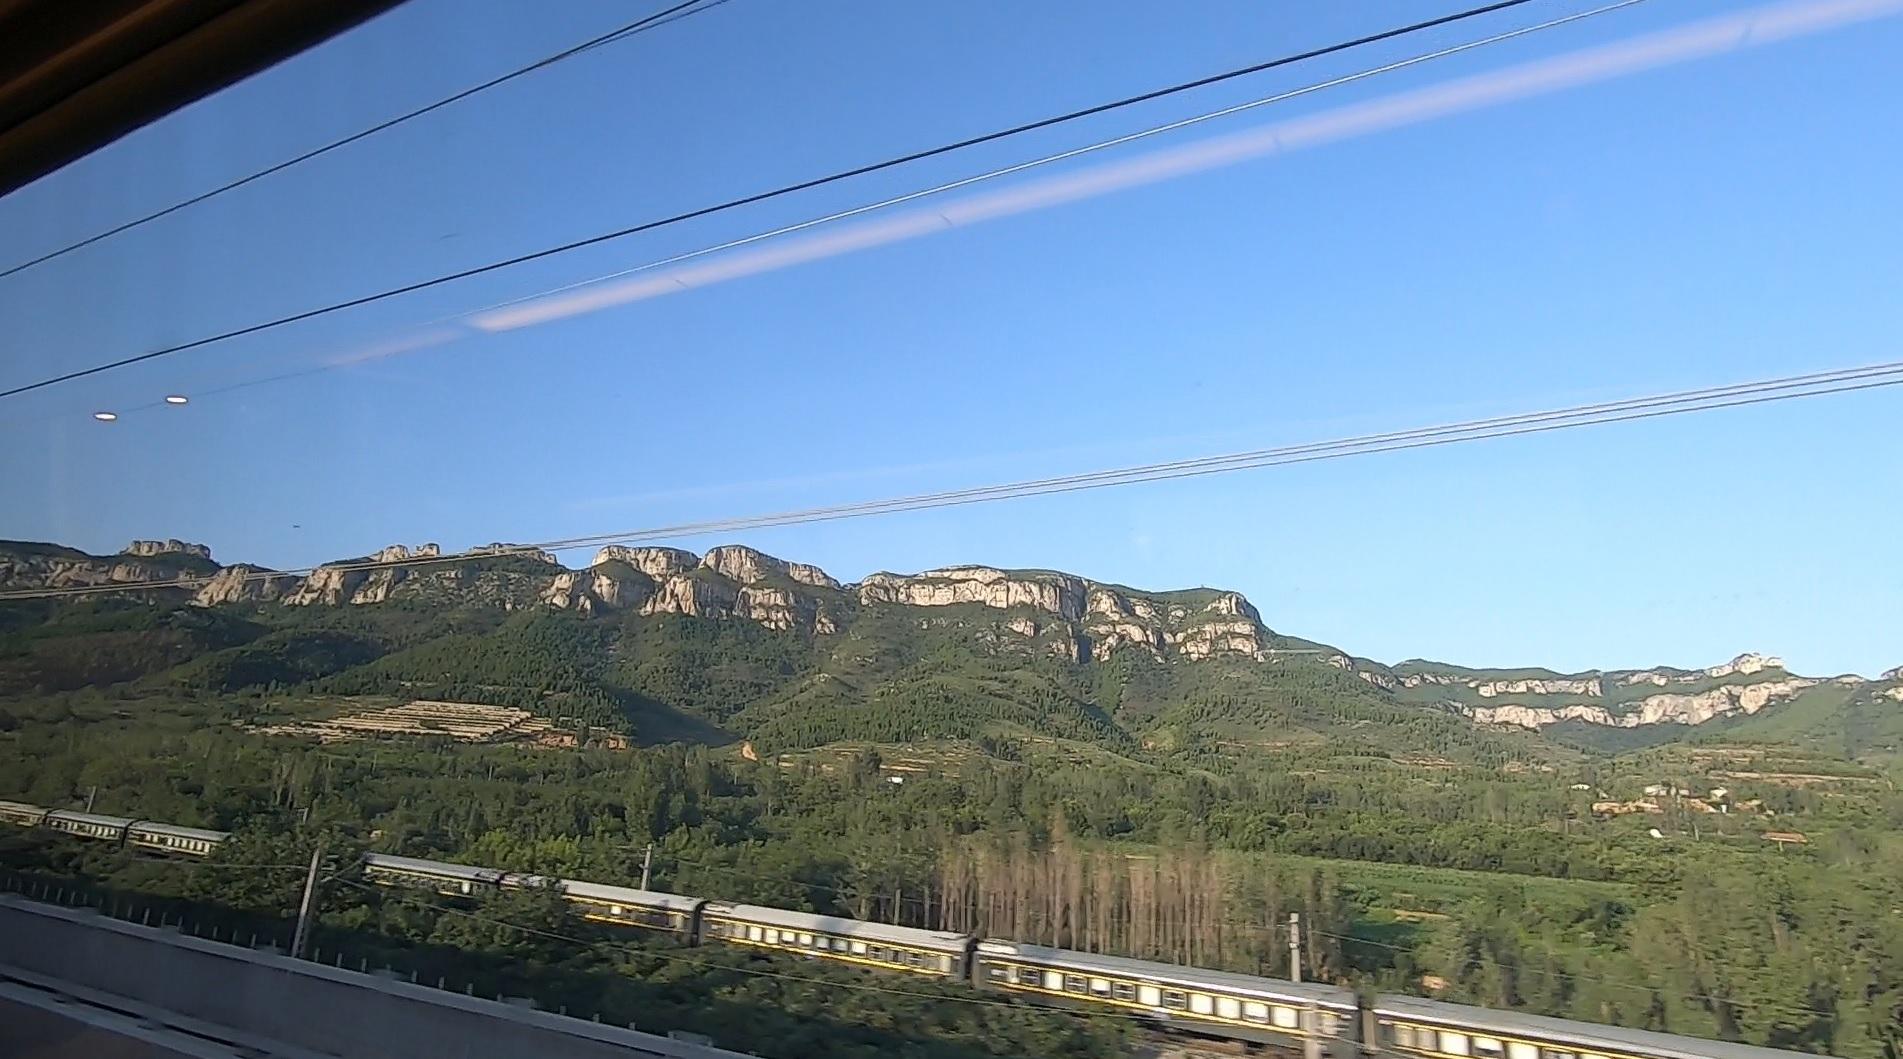 Pociągiem z Szanghaju do Pekinu